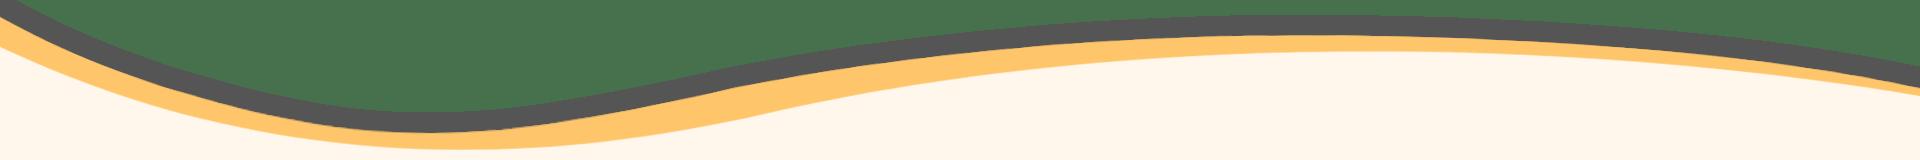 Texture bottom